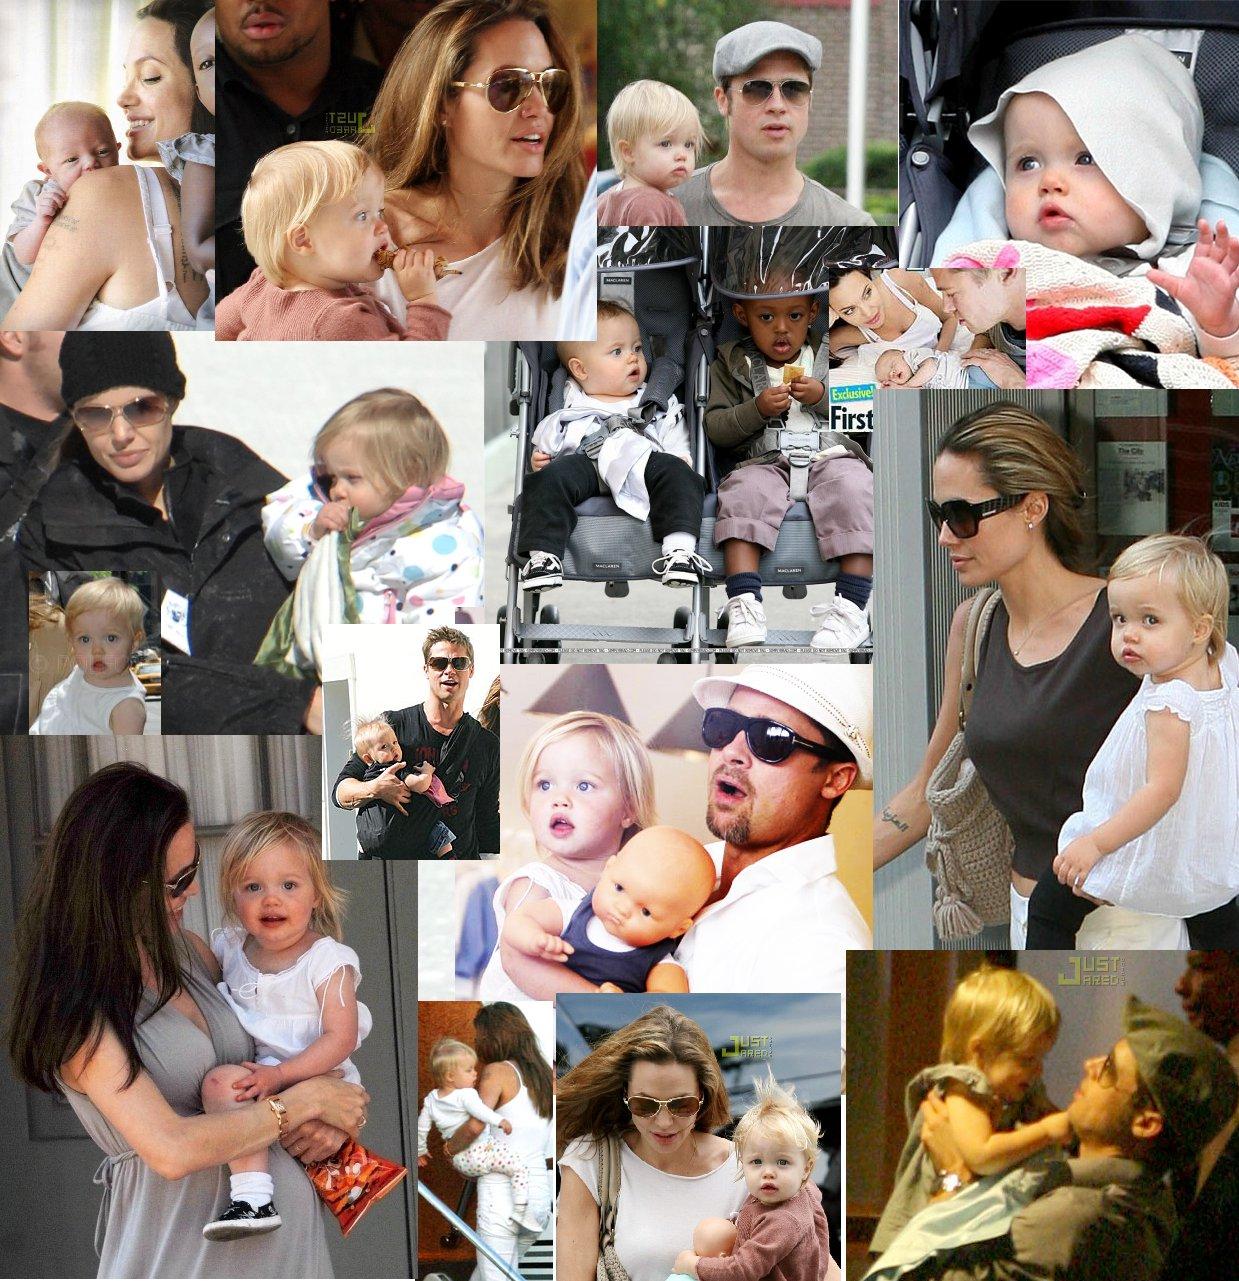 http://4.bp.blogspot.com/-pgWpX4XMZrw/TxUaUwcV5UI/AAAAAAAACMg/CGM-Tkal42w/s1600/brad-pitt-angelina-jolie-and-family.jpg